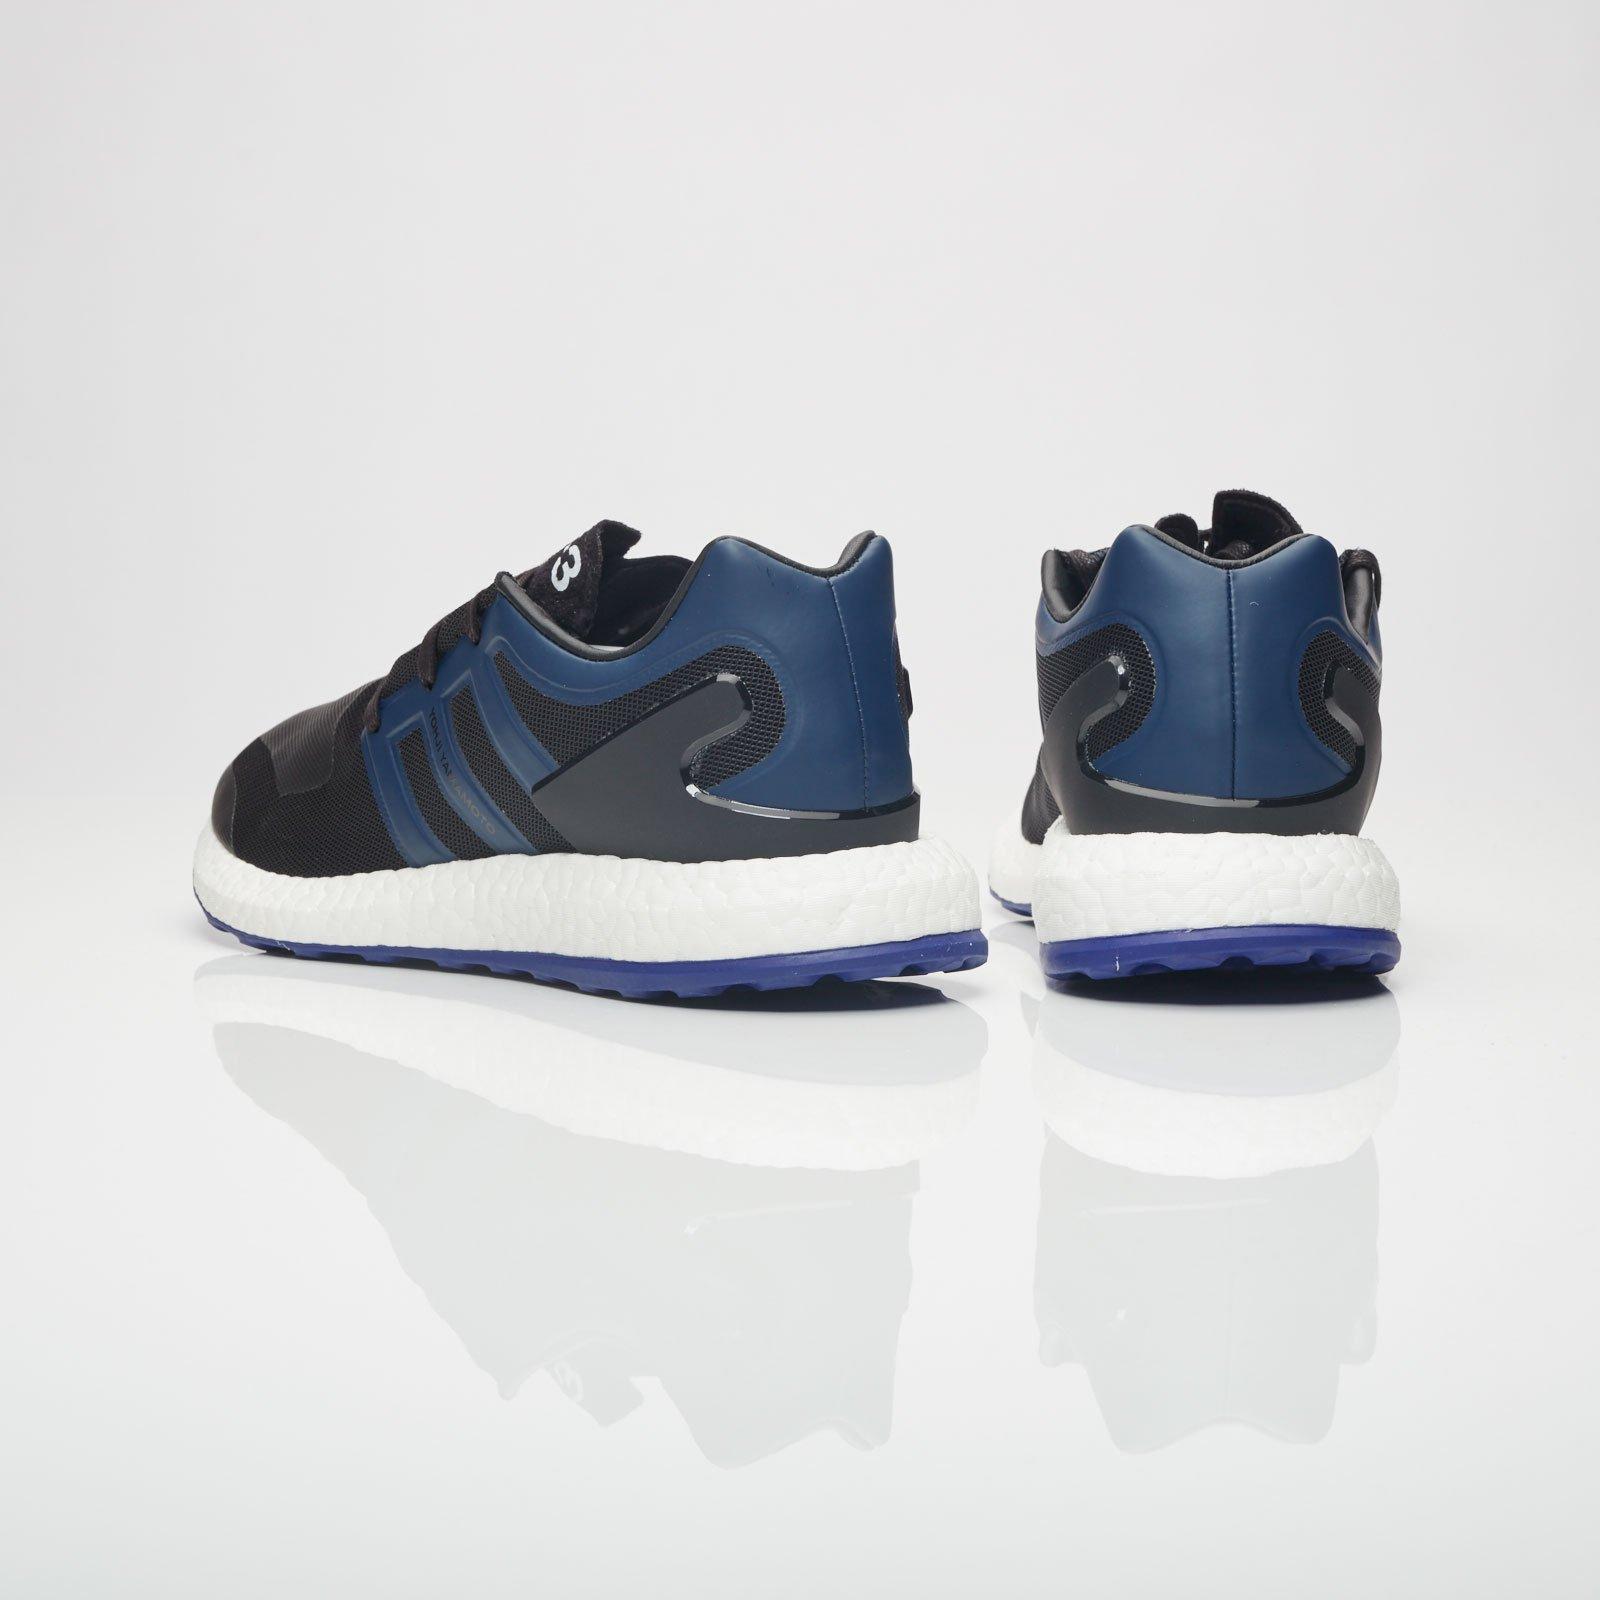 b0a92df6d adidas Pureboost - By8956 - Sneakersnstuff